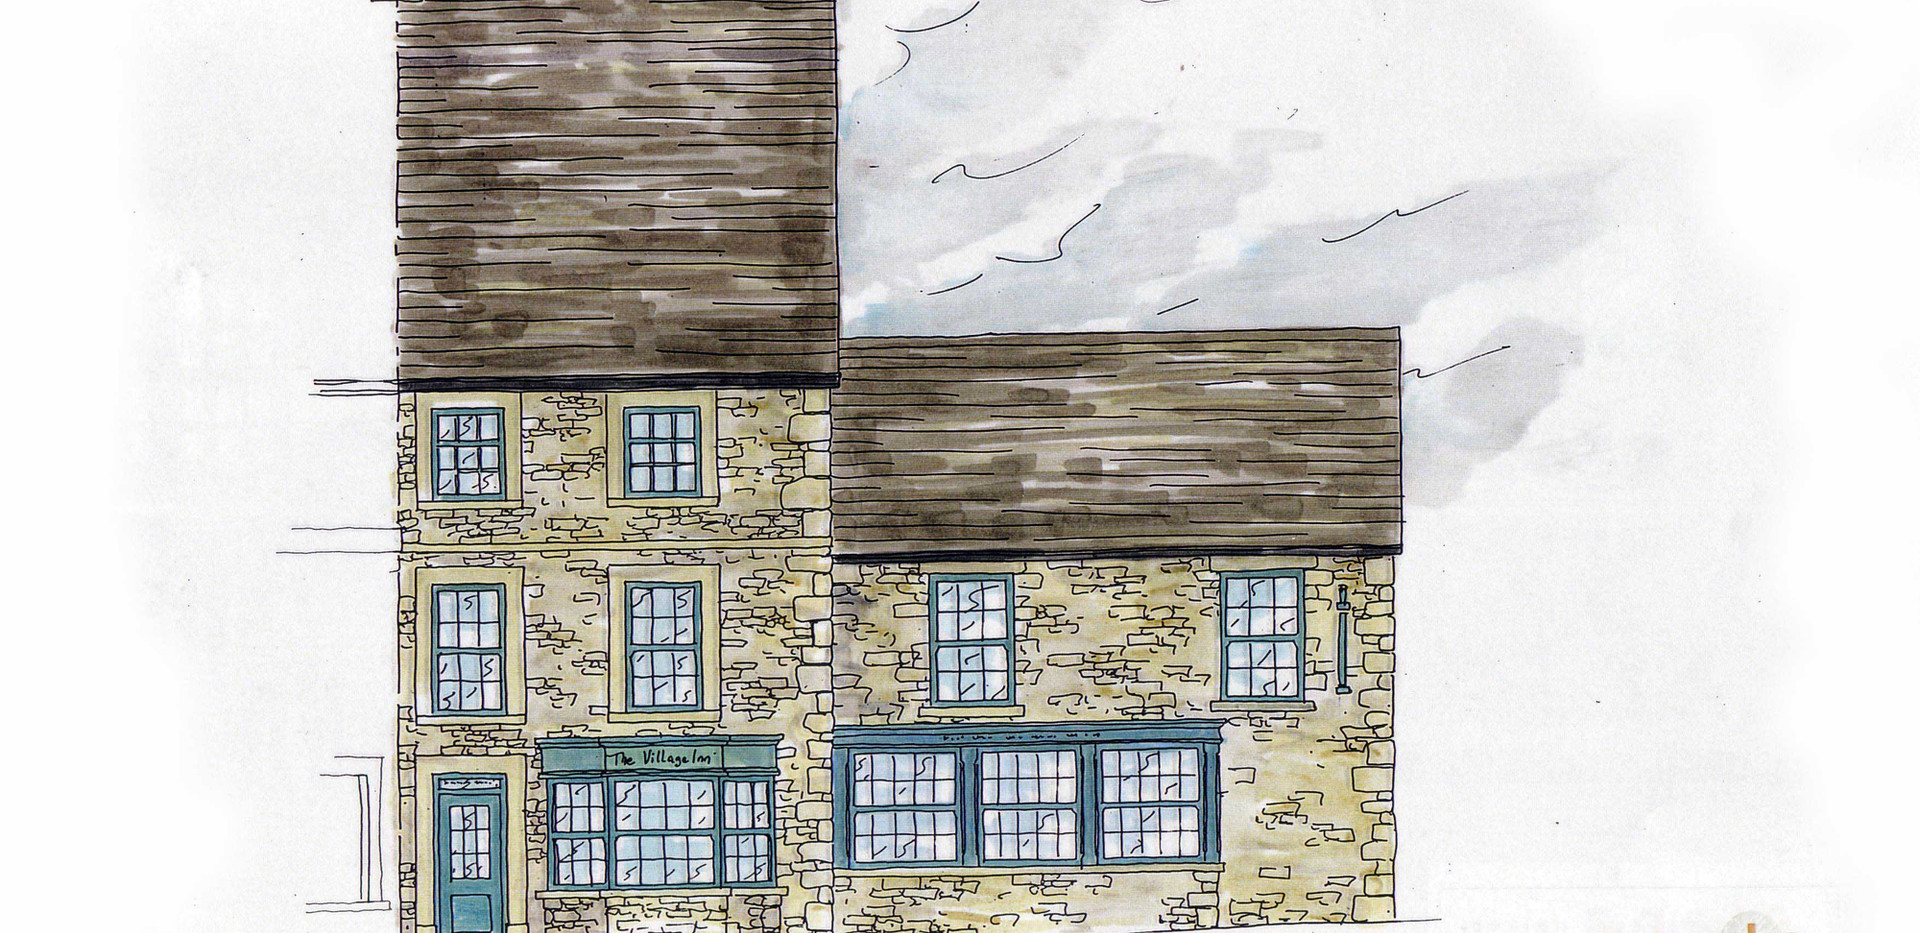 The Village Inn, Nailsworth, Cotswolds, Gloucestershire, AM Design, Traditional Irish Pub Design Specialists,